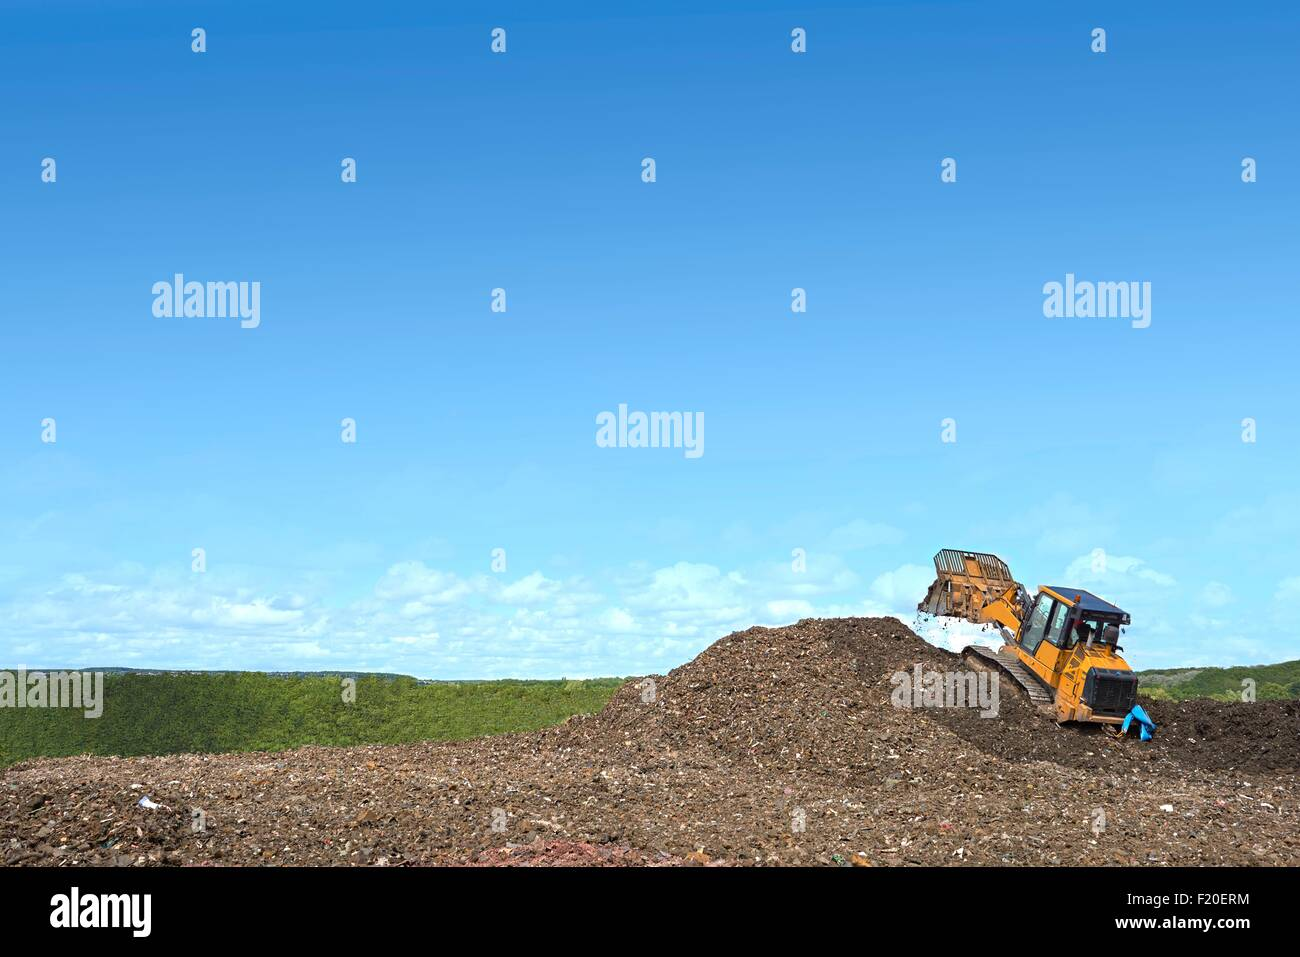 Digger on mound burying waste on landfill site - Stock Image